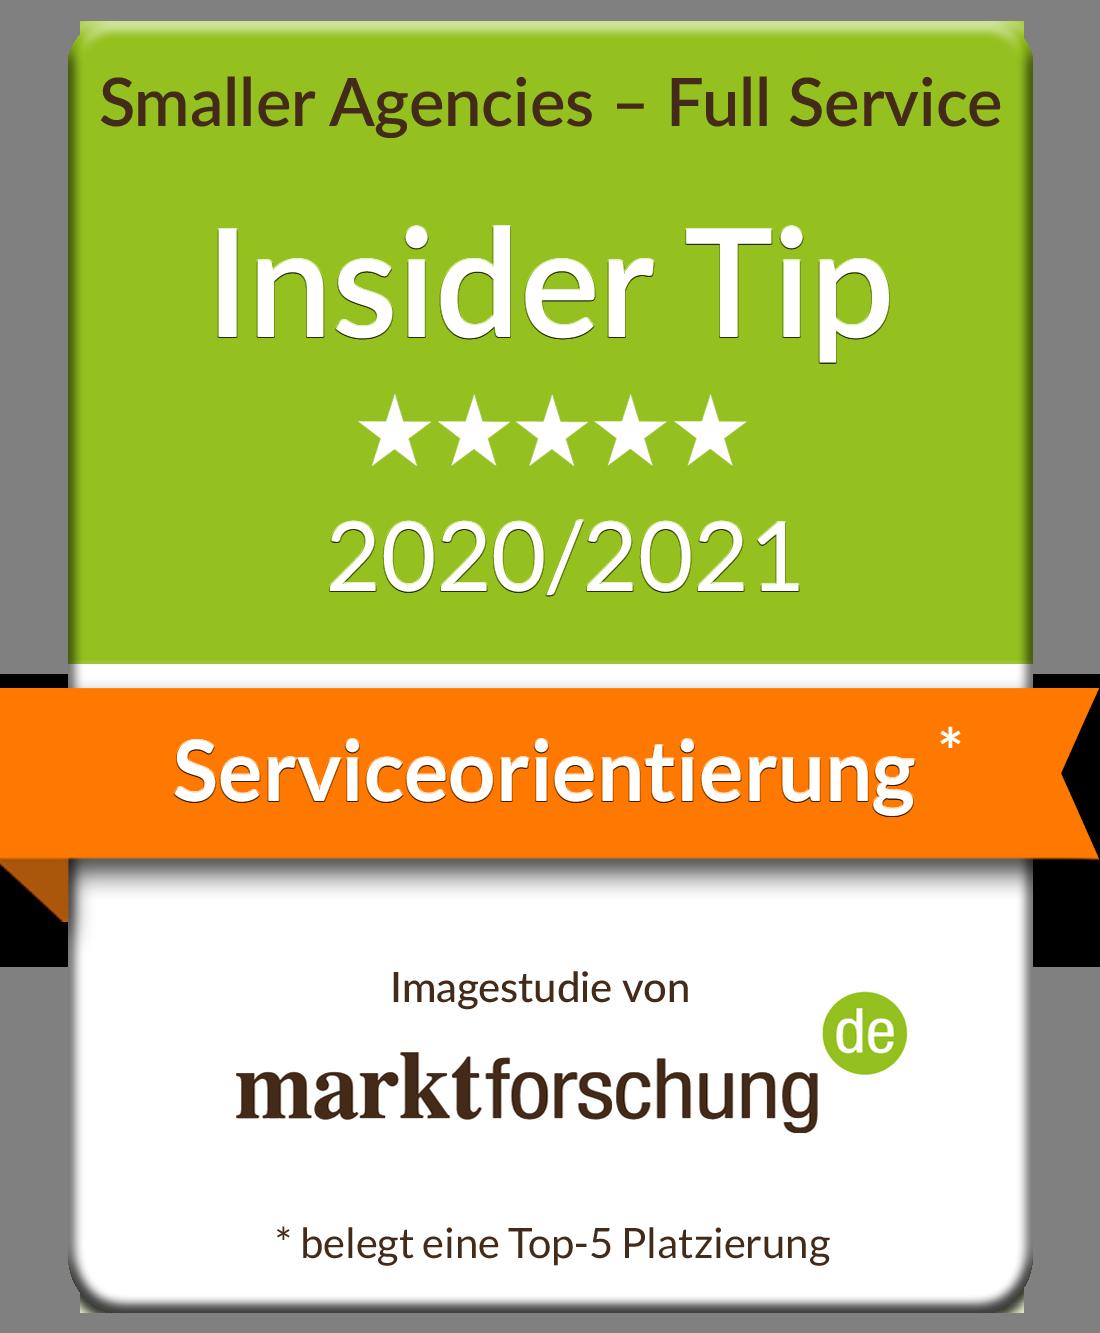 marktforschung.de Serviceorientierung